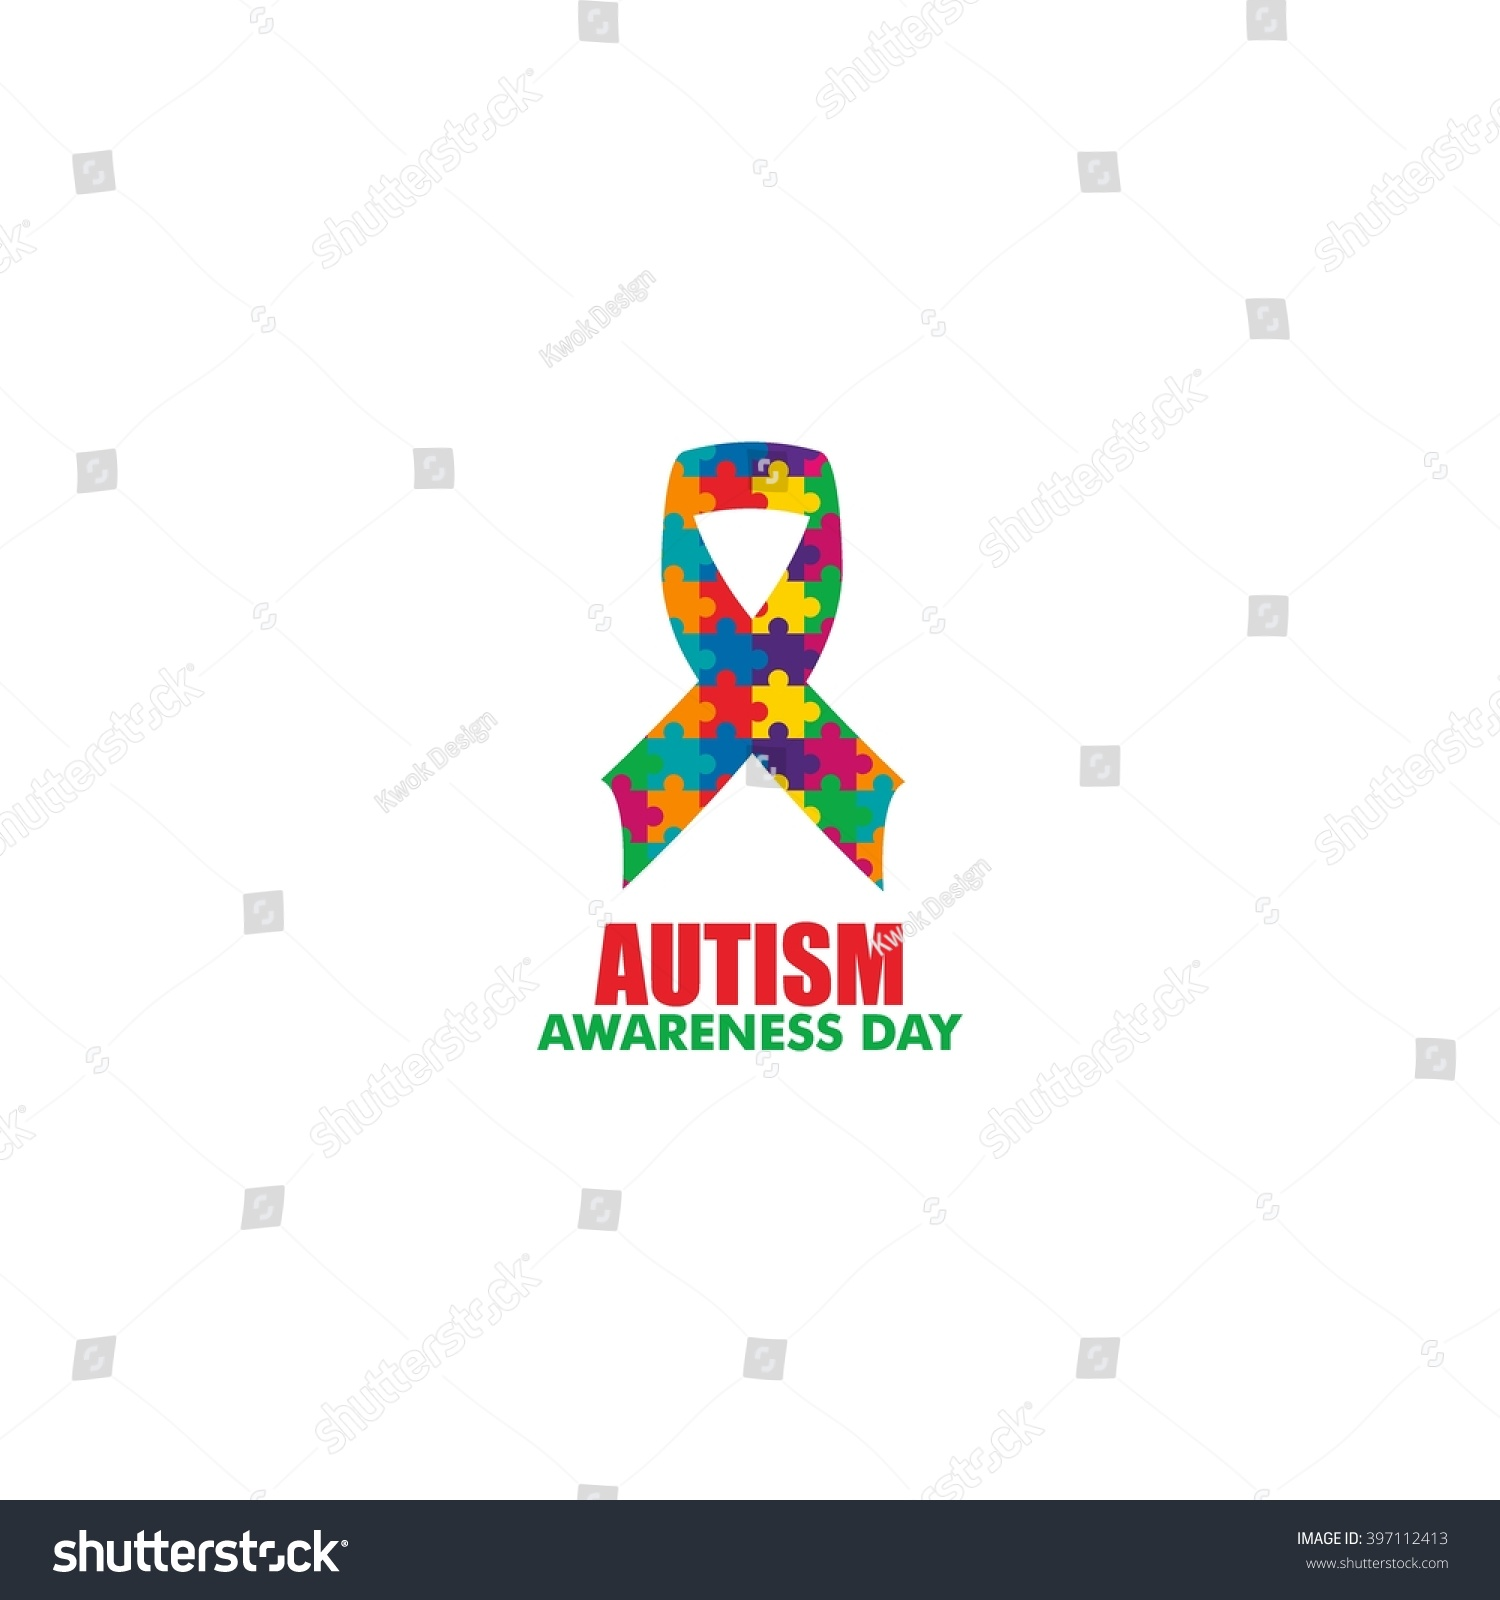 World autism awareness day logo design stock vector 397112413 world autism awareness day logo design template vector illustration colorful puzzles symbol biocorpaavc